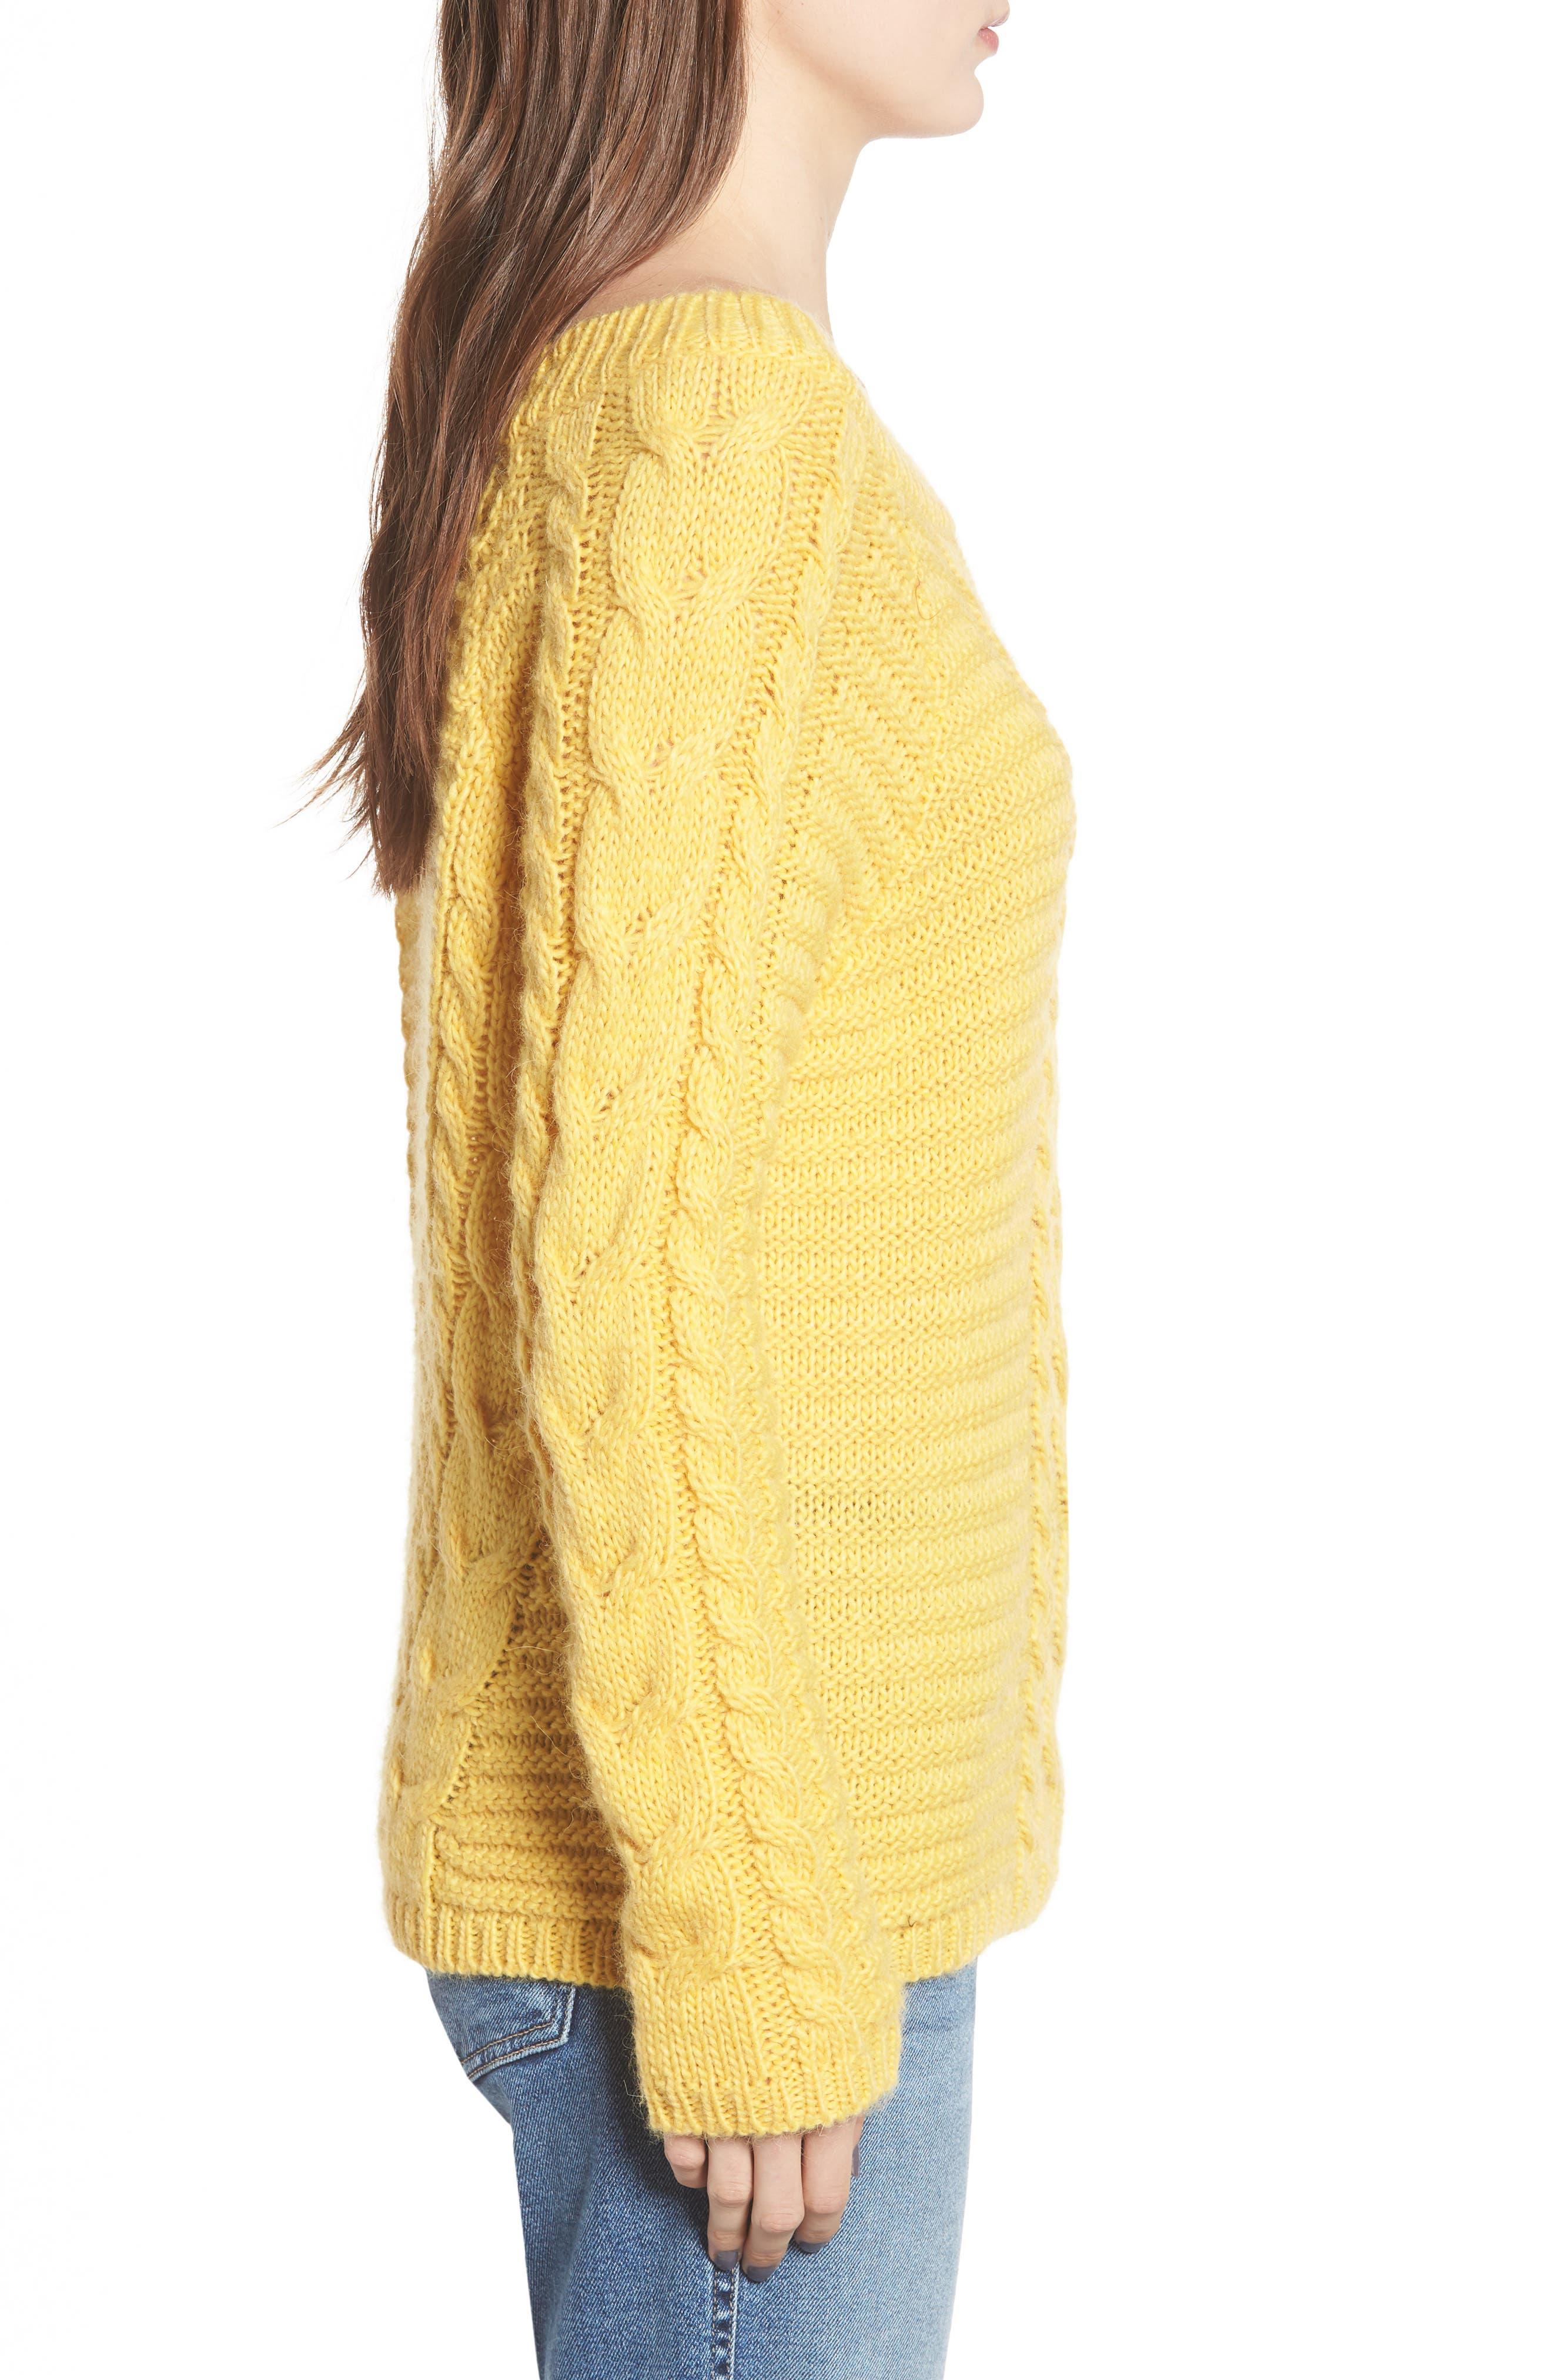 REBECCA MINKOFF,                             Juna Sweater,                             Alternate thumbnail 3, color,                             700